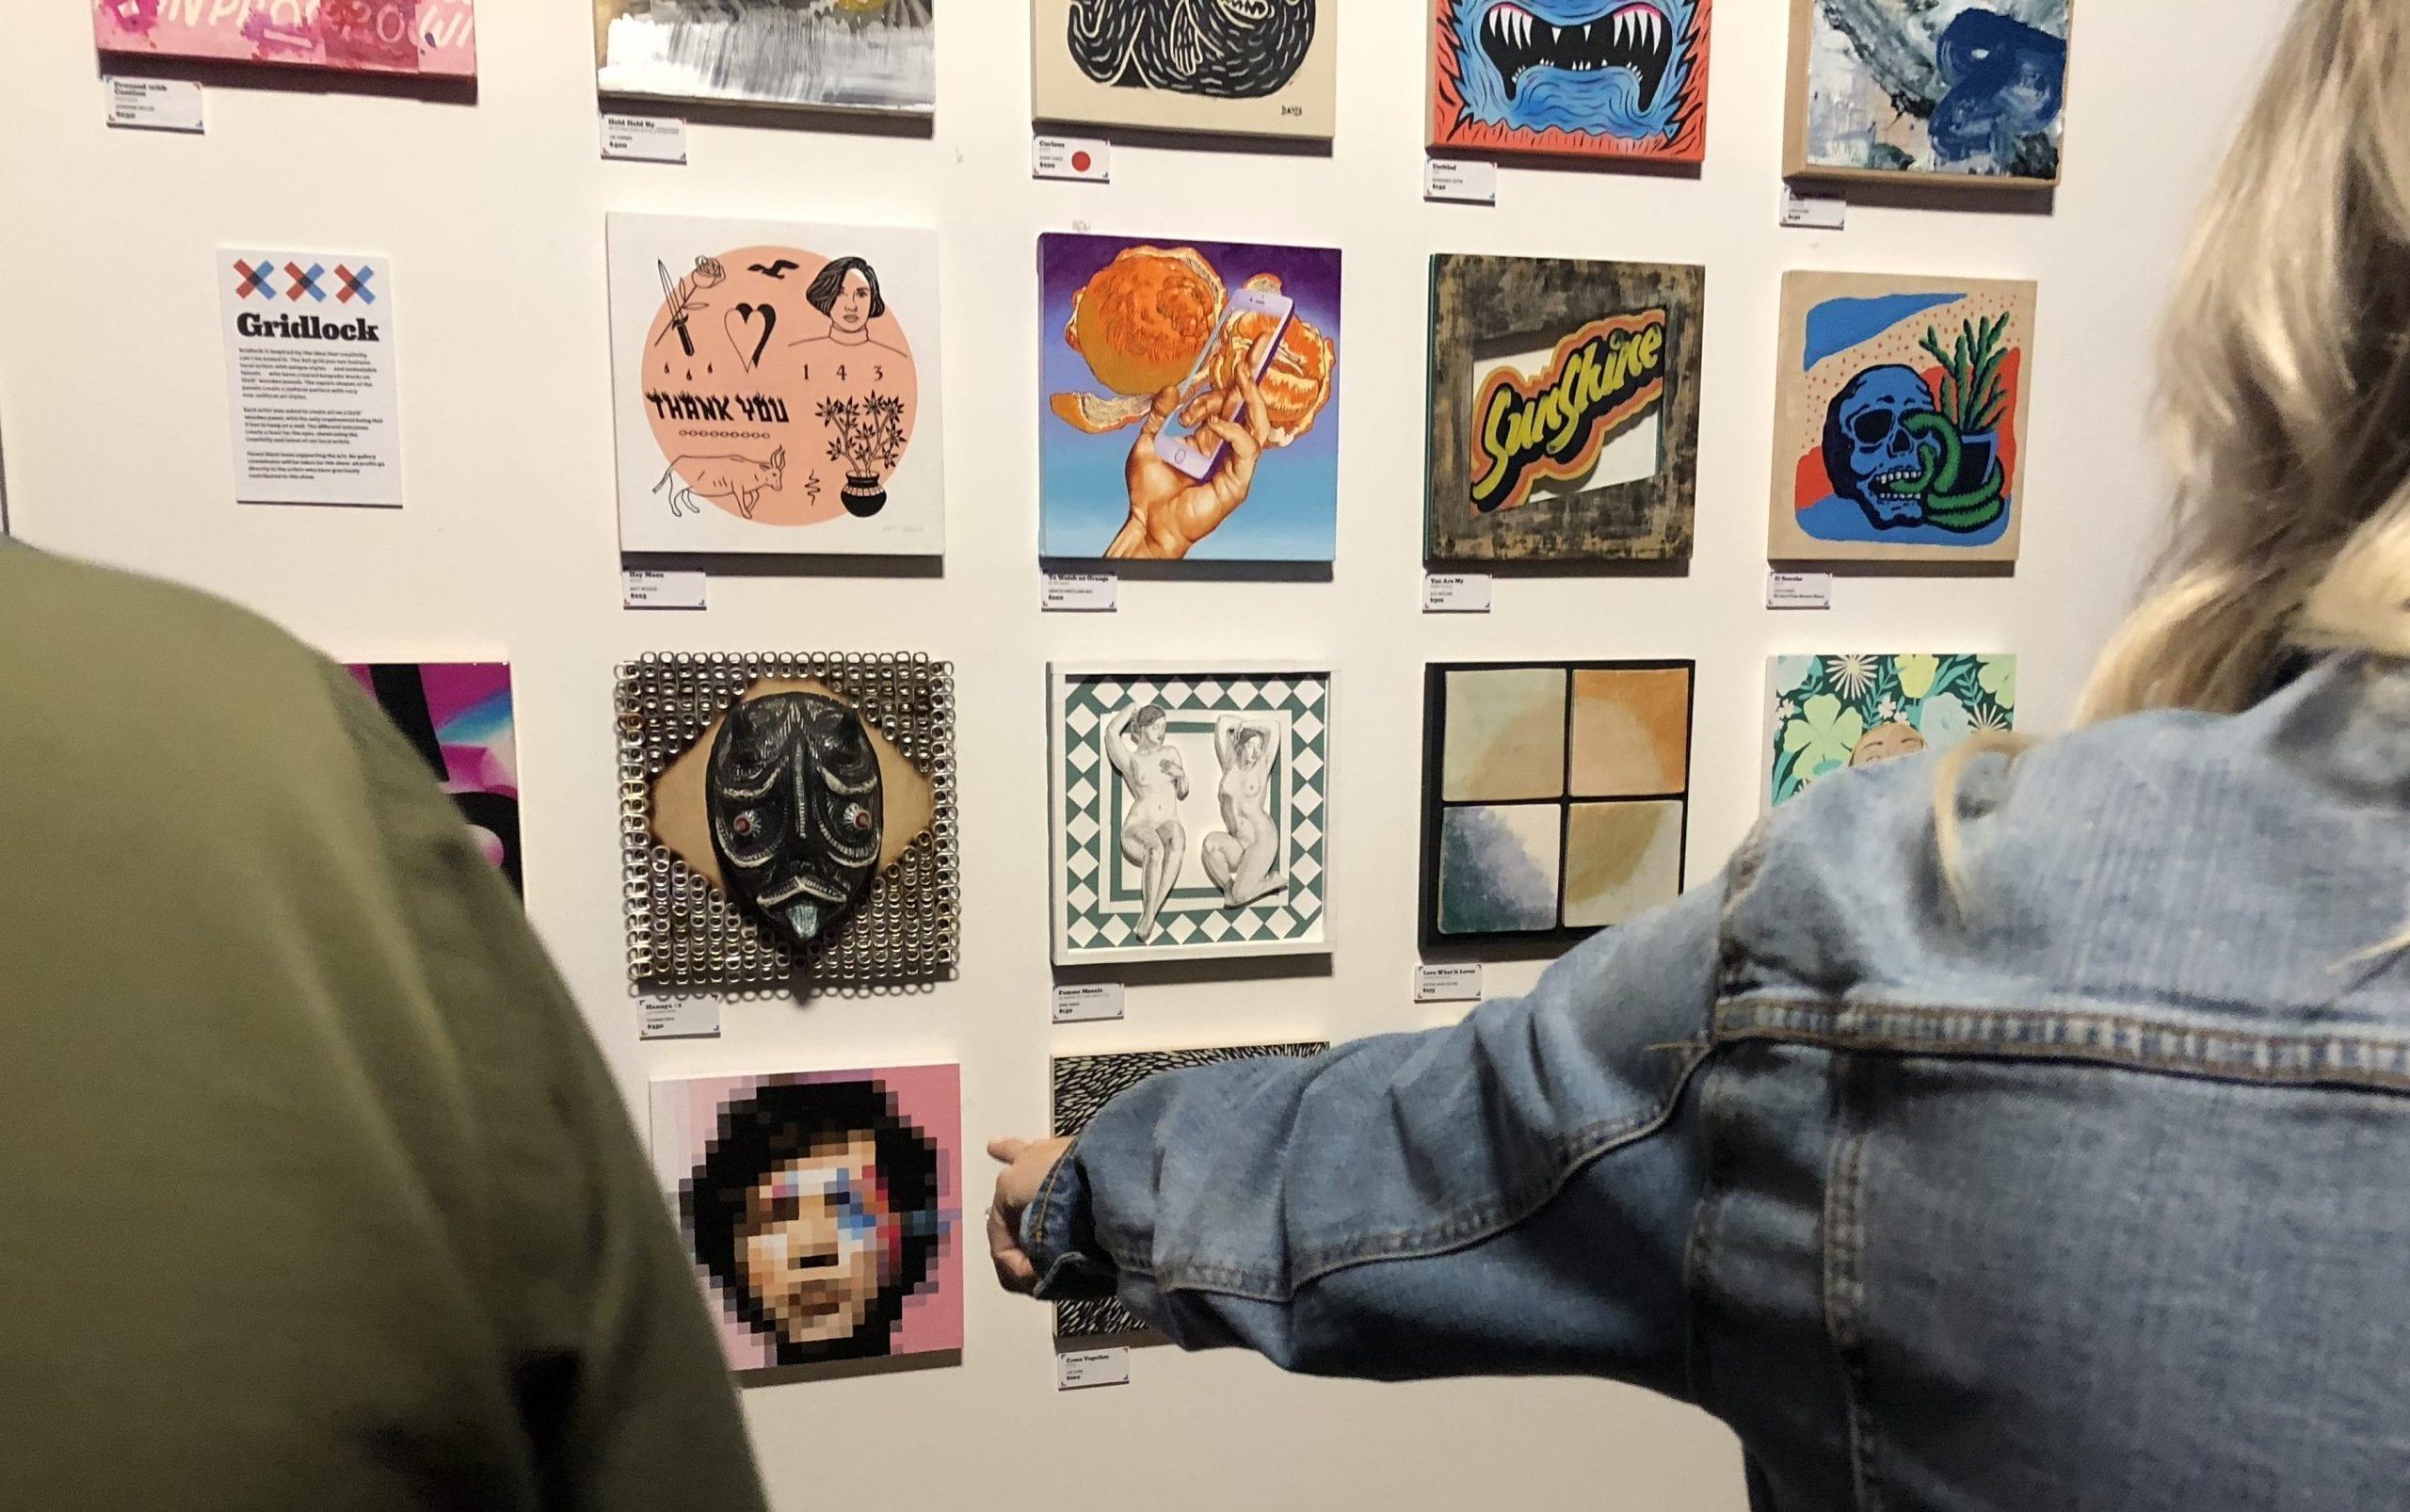 Gridlock Art Show Celebrates Art — Without Limitations